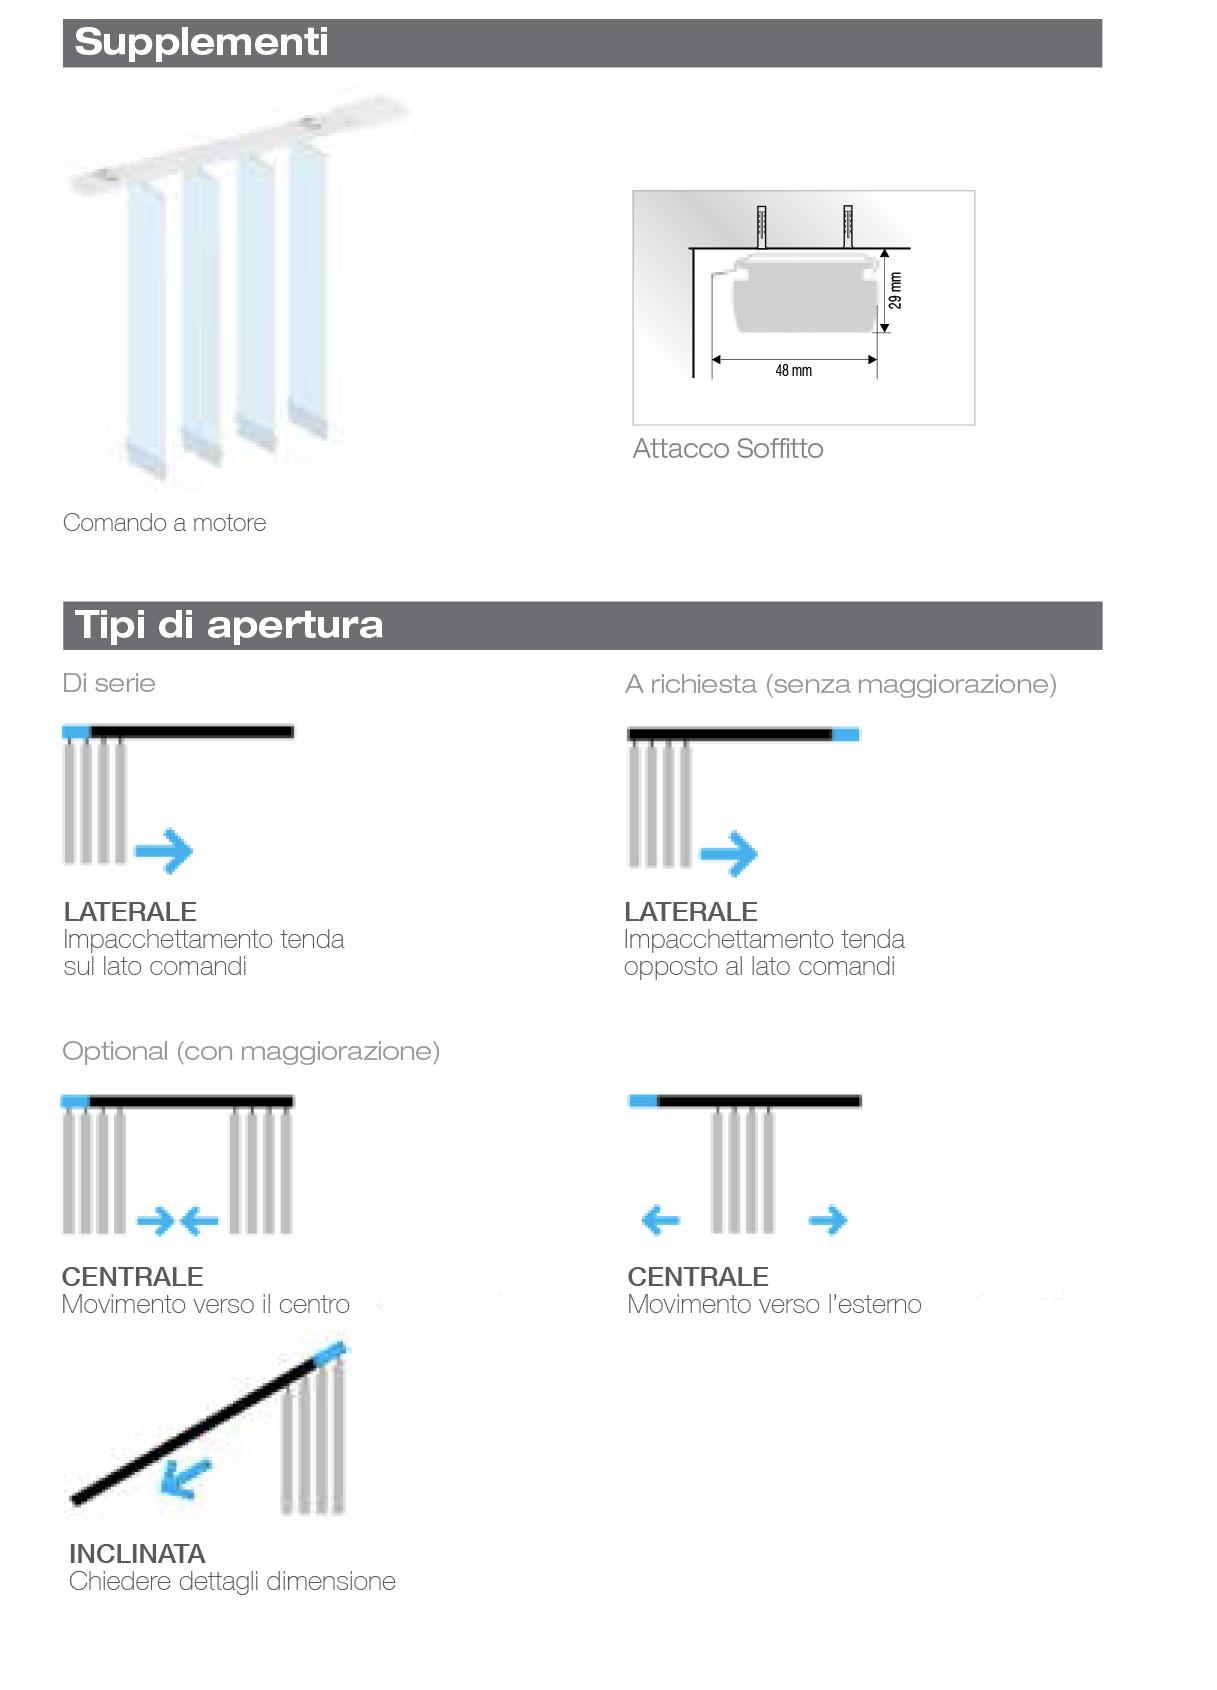 Tende Per Soffitti Inclinati serie verticali | spazio tende lecce - tende da sole zanzariere